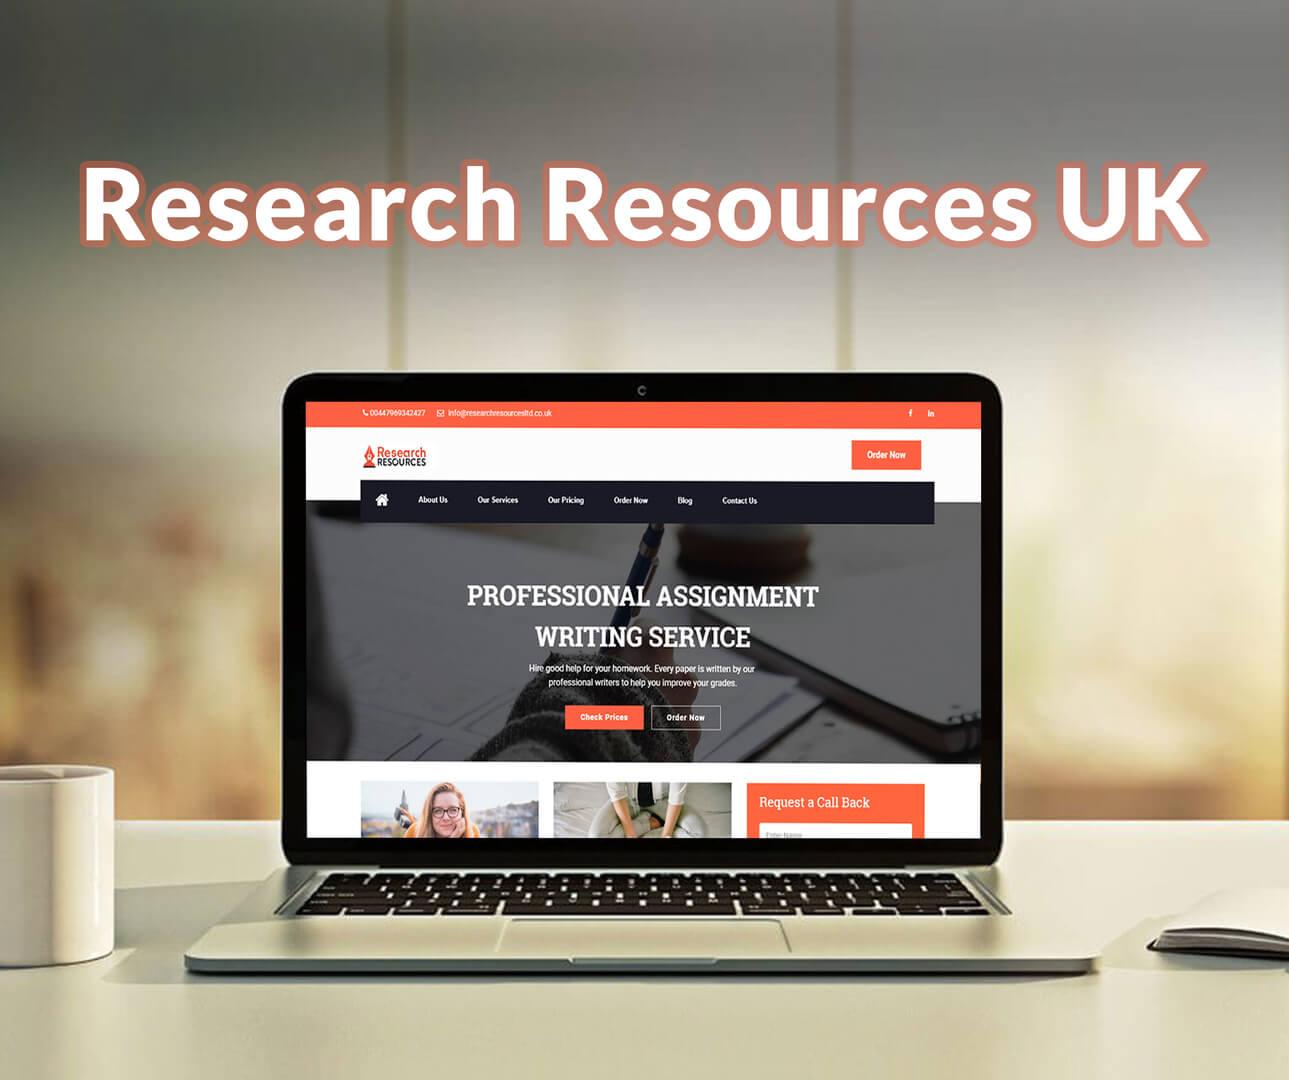 Research Resources UK Website Development